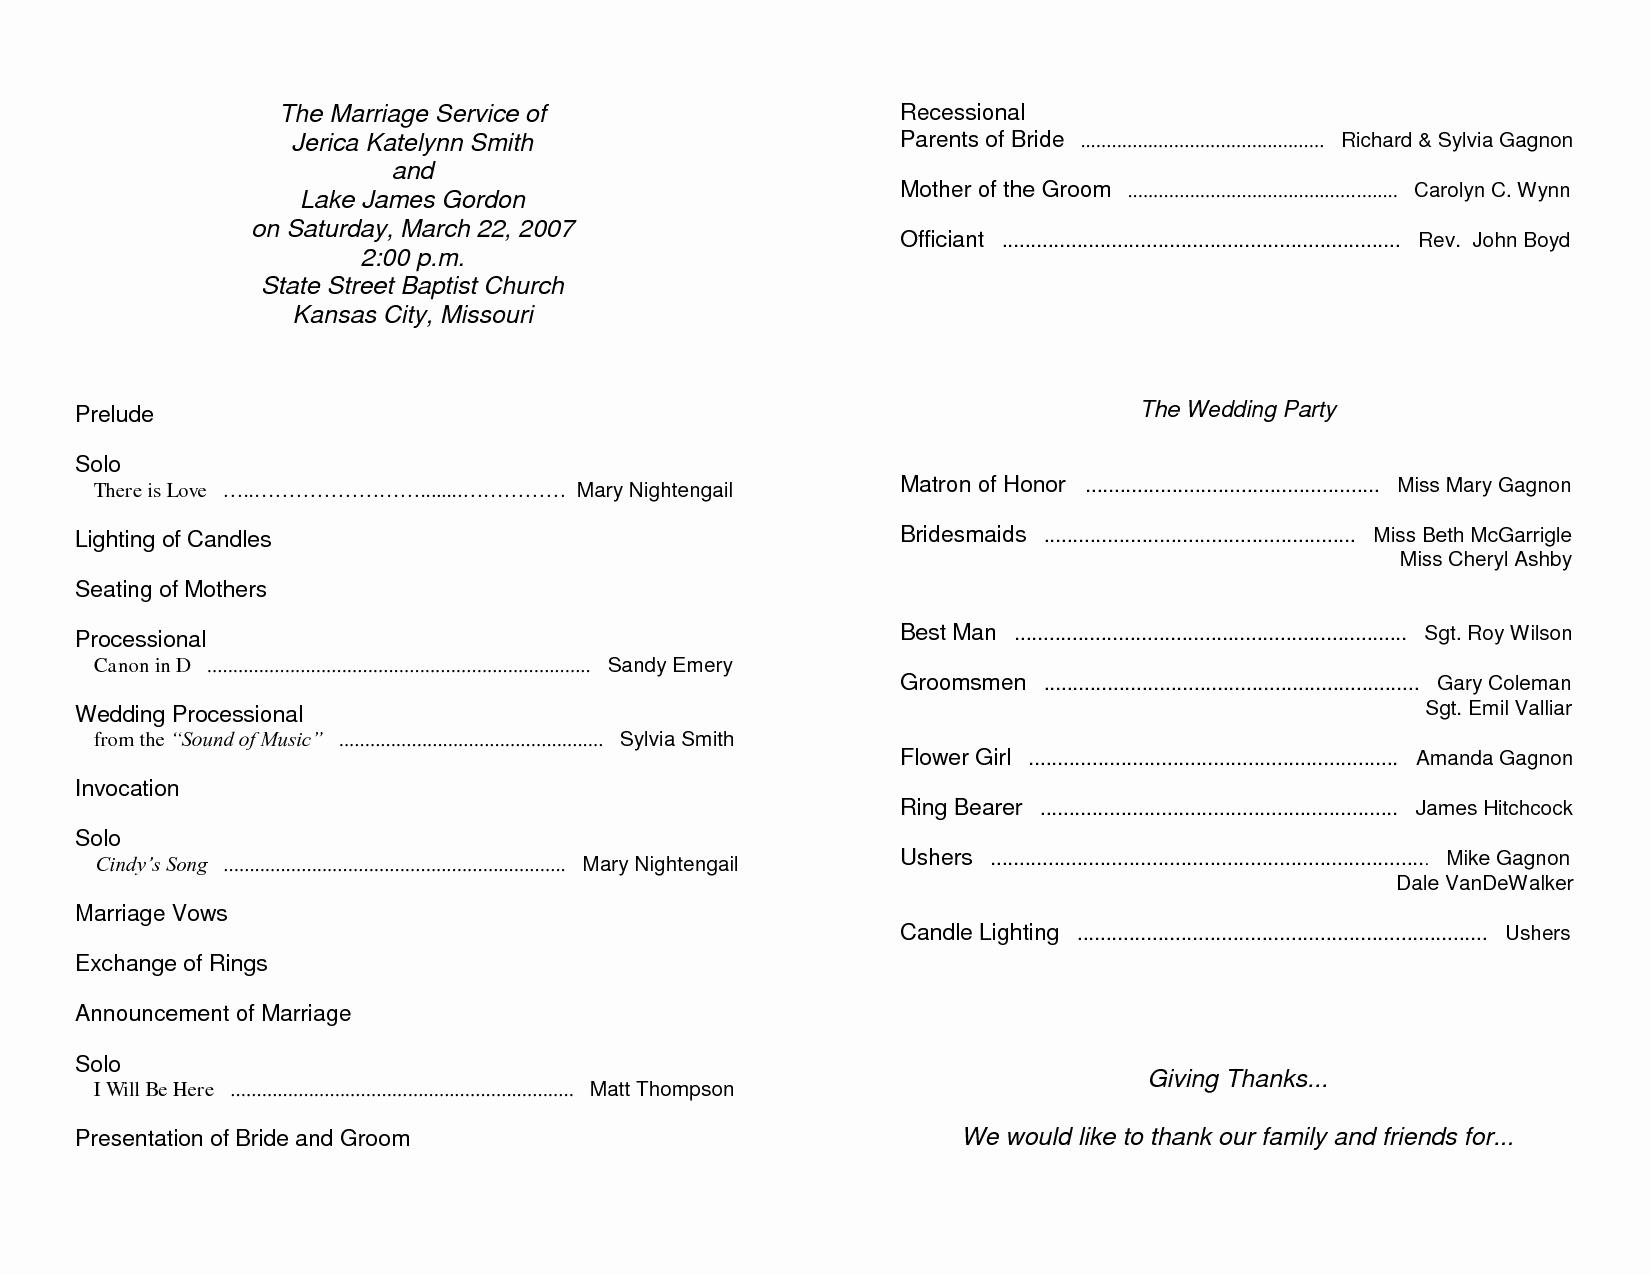 Free Church Program Template Microsoft Word Awesome Church Bulletin Templates Word Kayskehauk